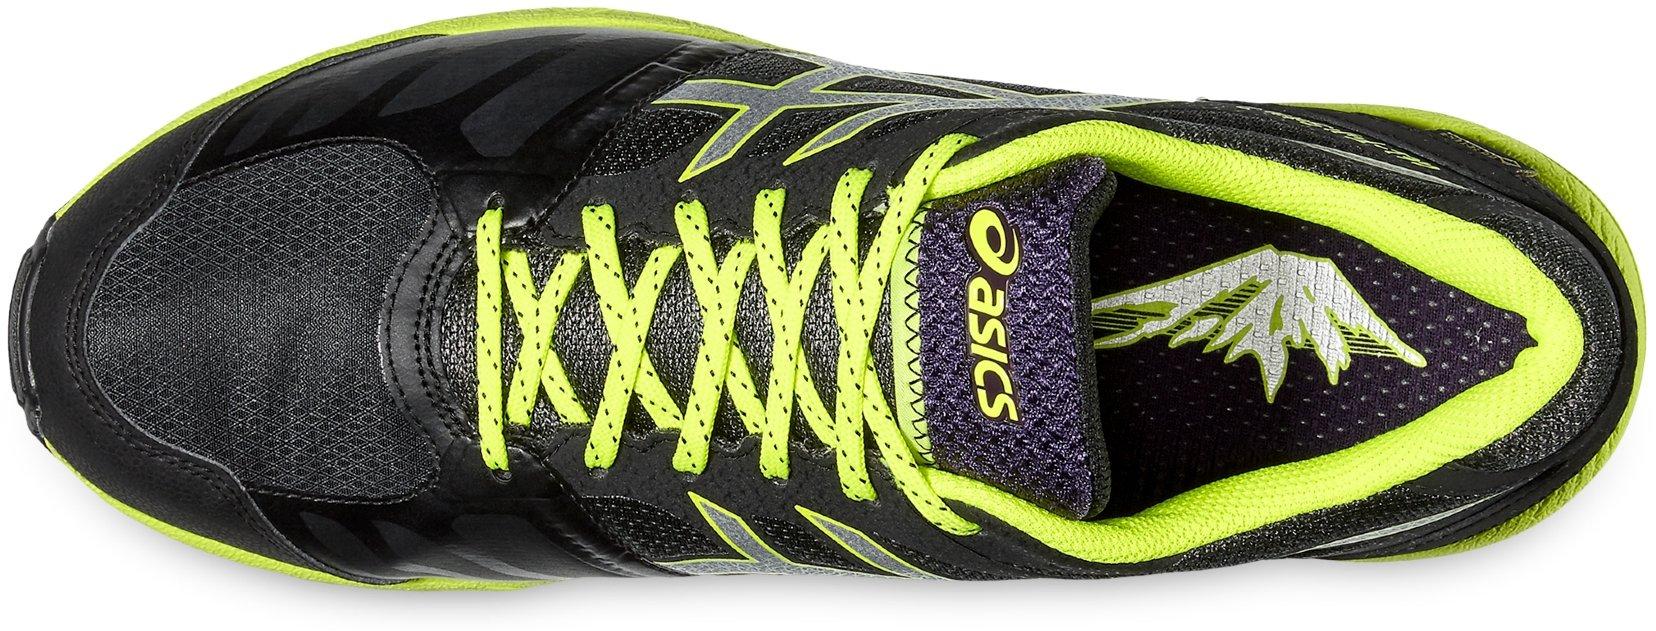 b351f5e1 Купить кроссовки Asics Gel-FujiSetsu 2 G-TX | Интернет-магазин RunLab